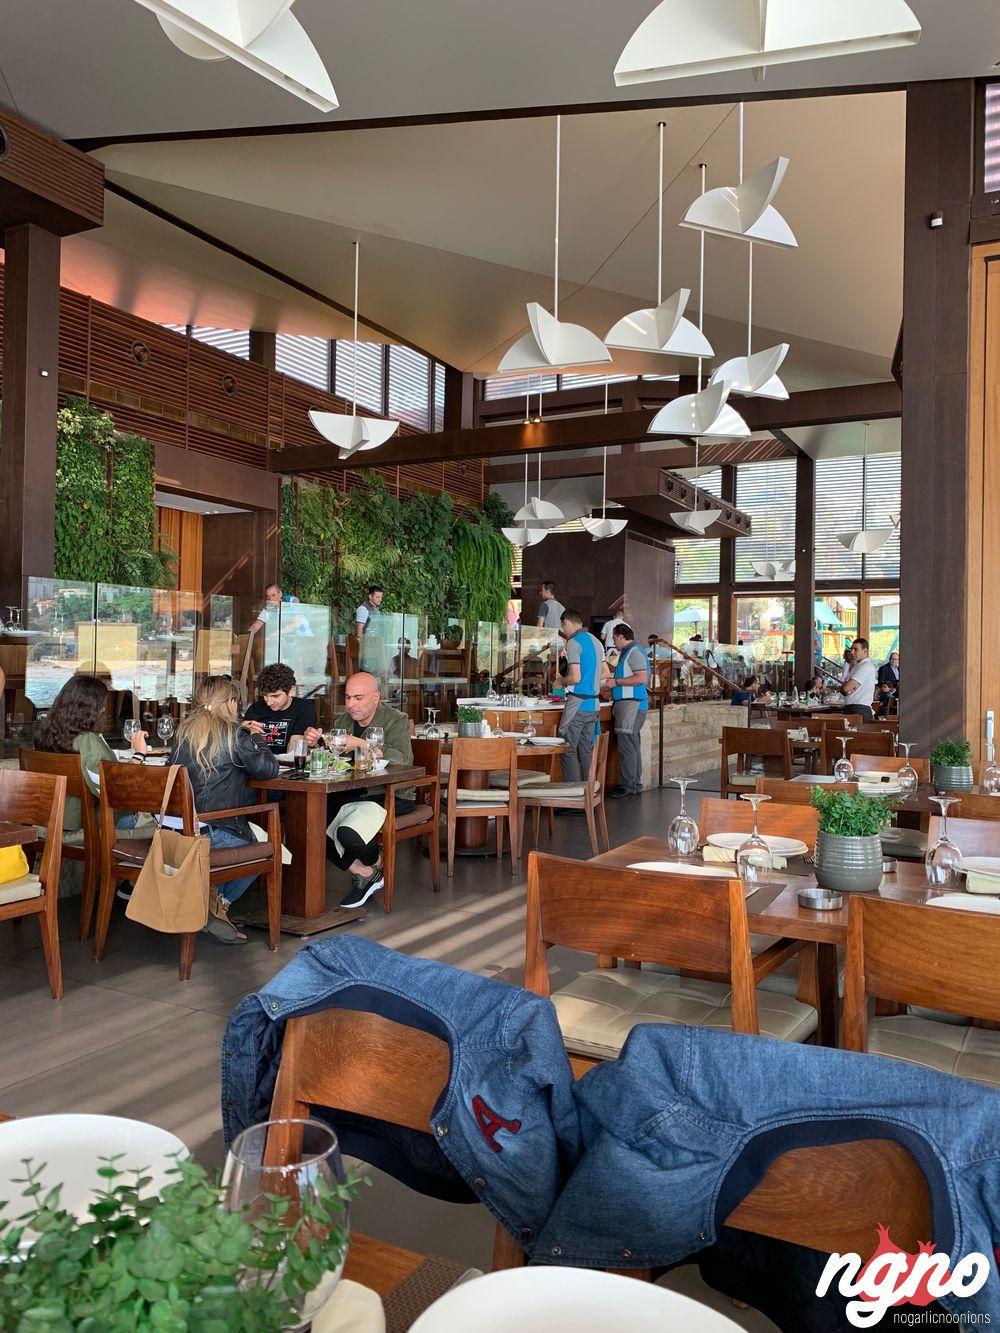 sultan-brahim-seafood-restaurant-lebanon-food-nogarlicnoonions-872018-11-18-12-47-01